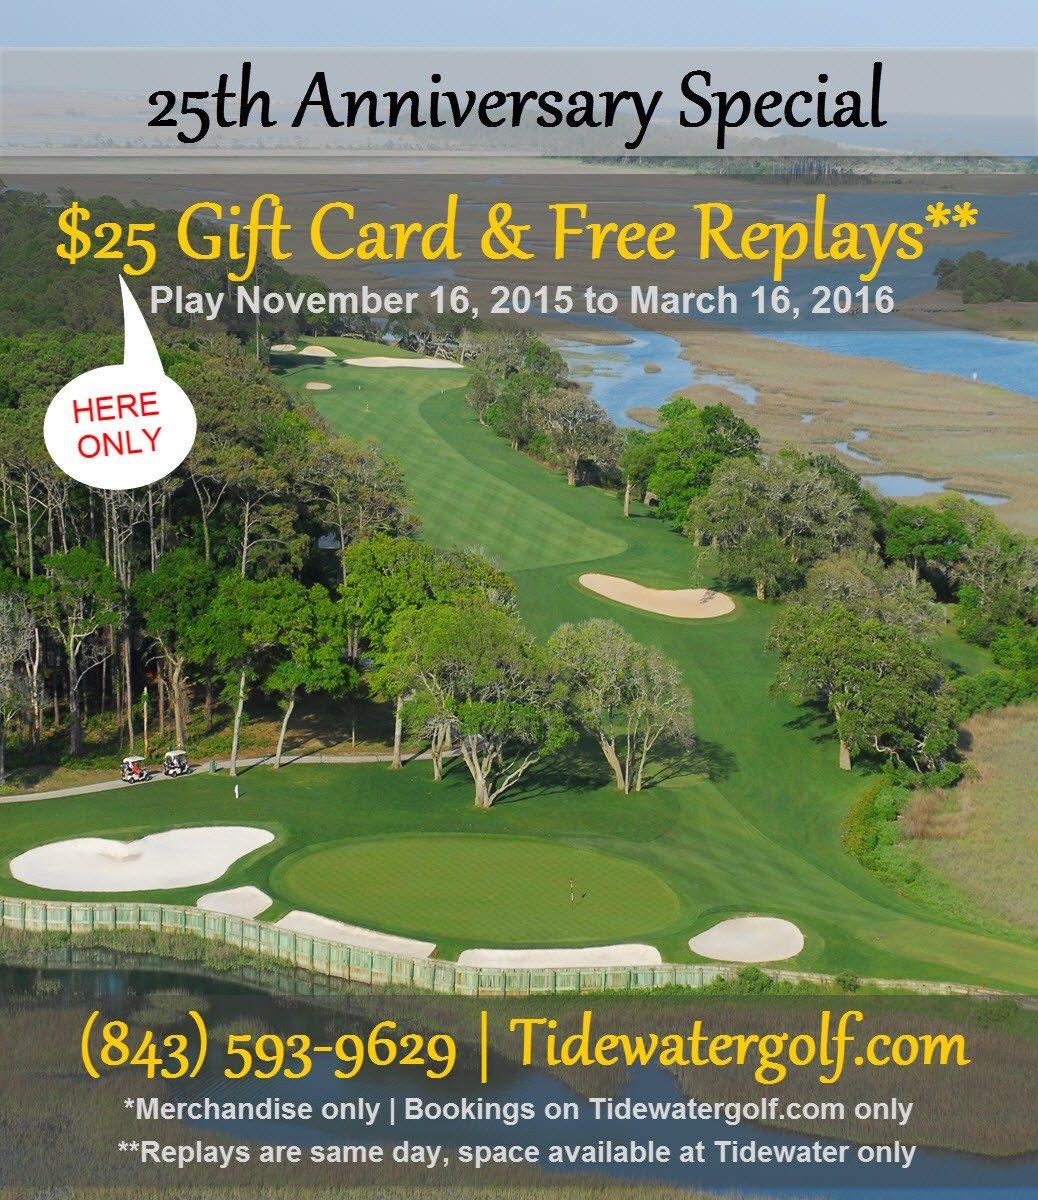 25th anniversary golf special Nov 16 to Mar 16 2016